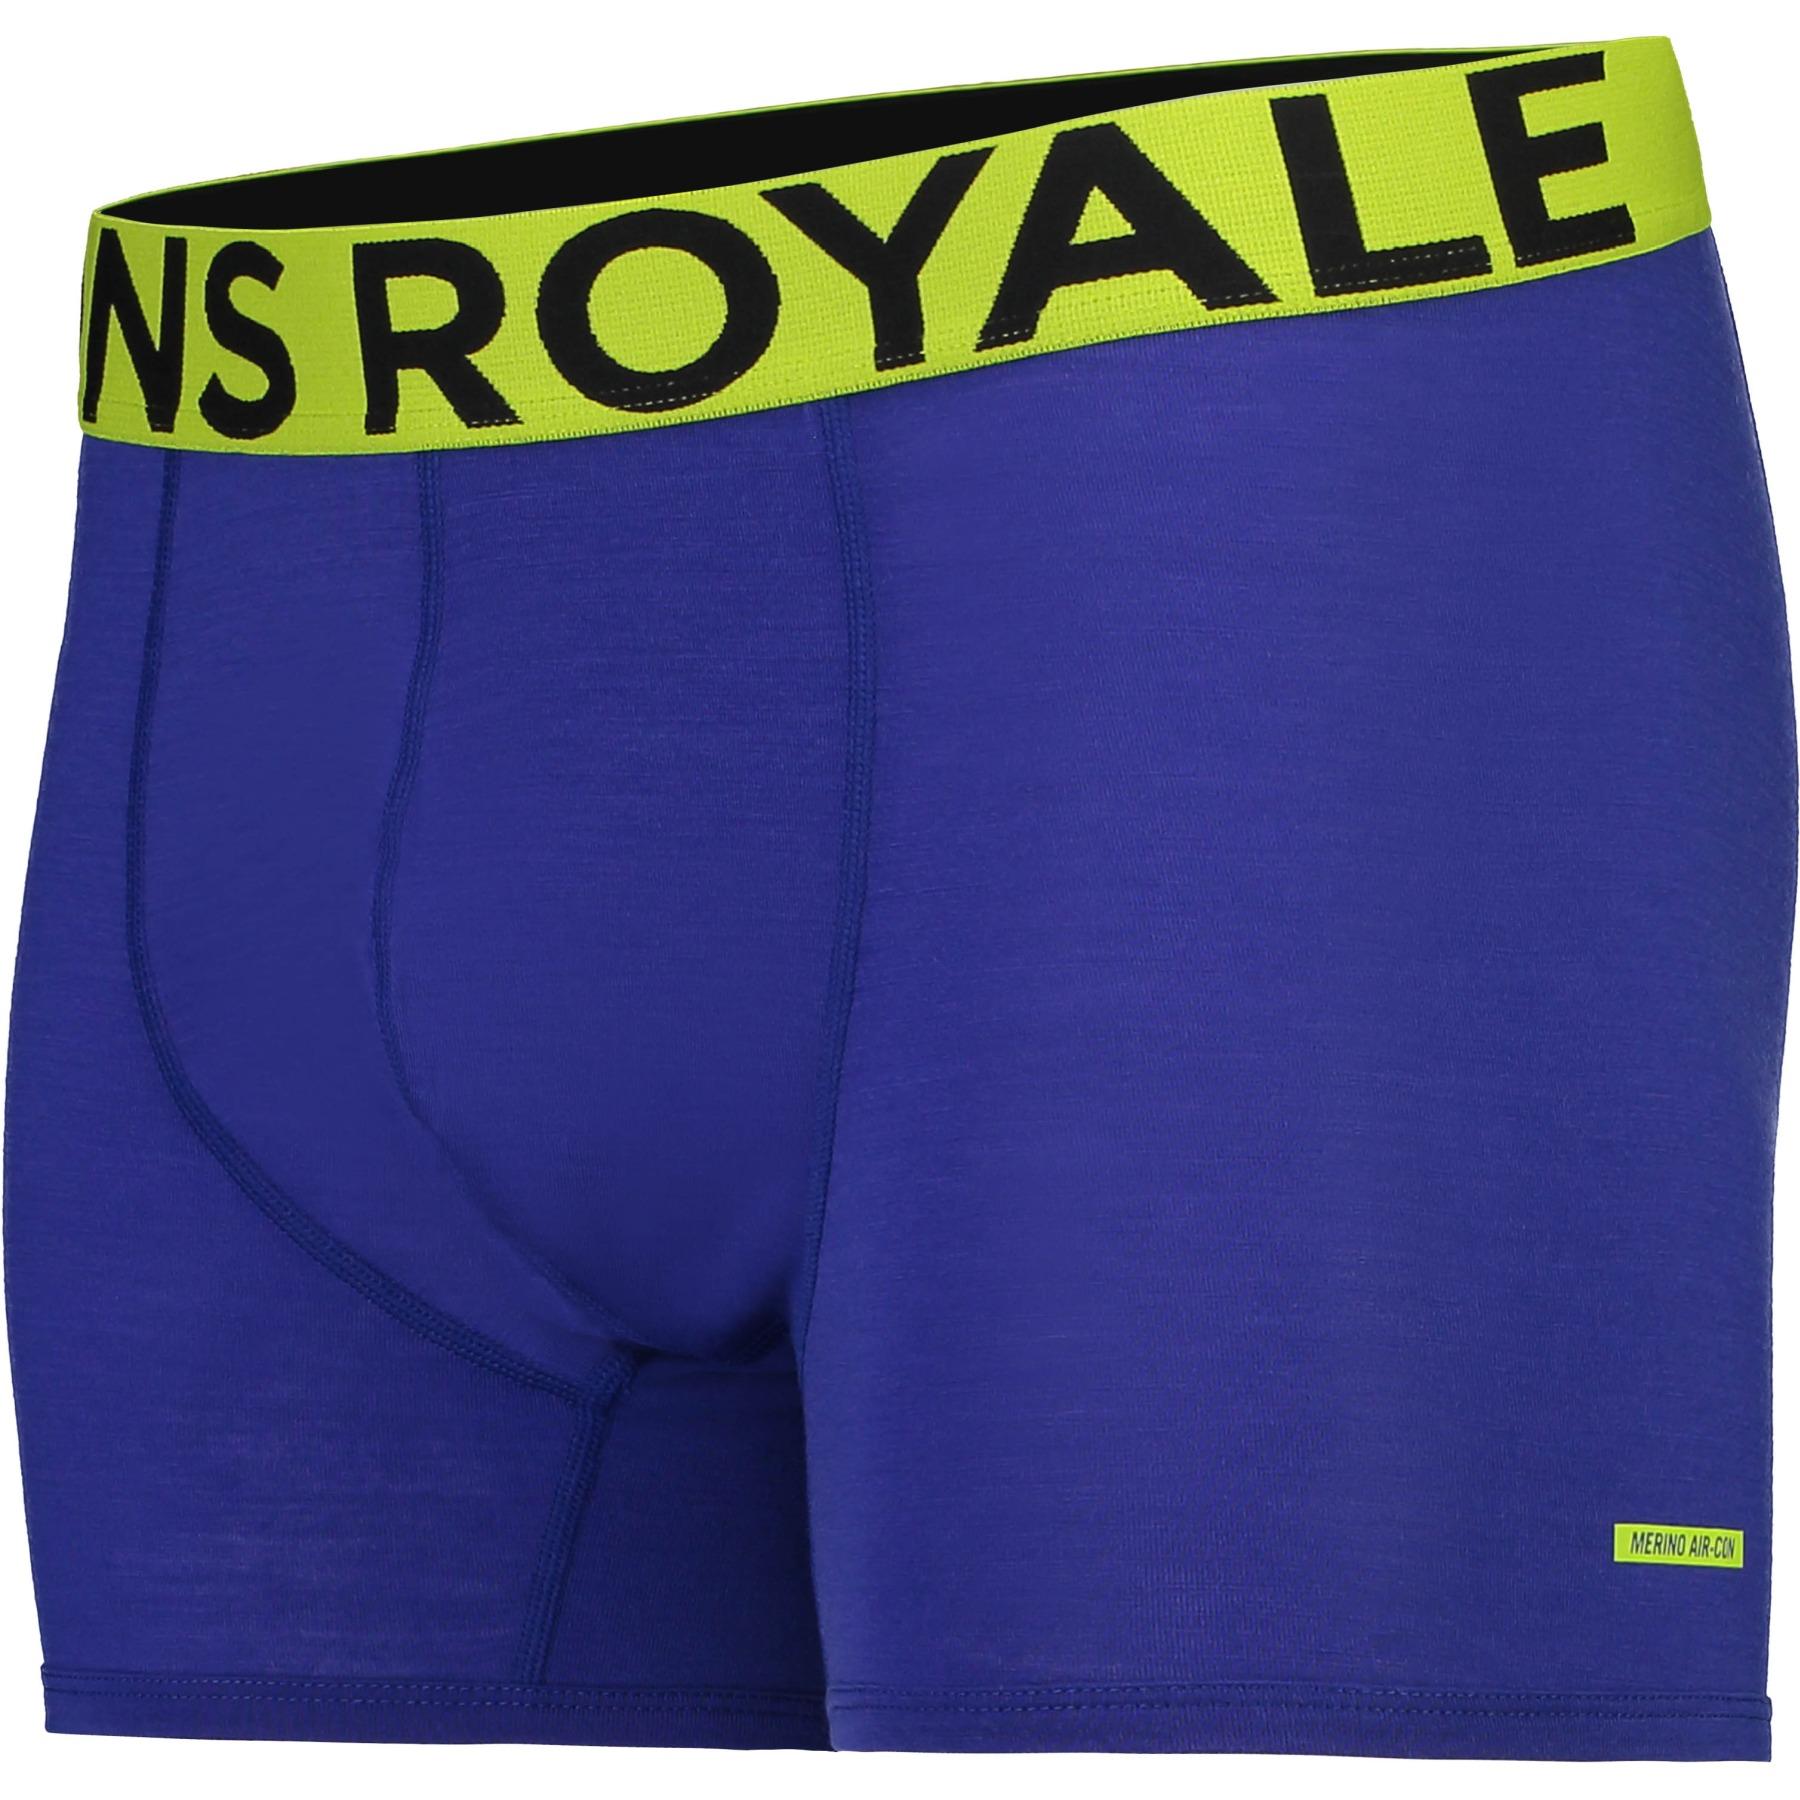 Mons Royale Hold 'em Shorty Boxer Shorts 100087 - ultra blue